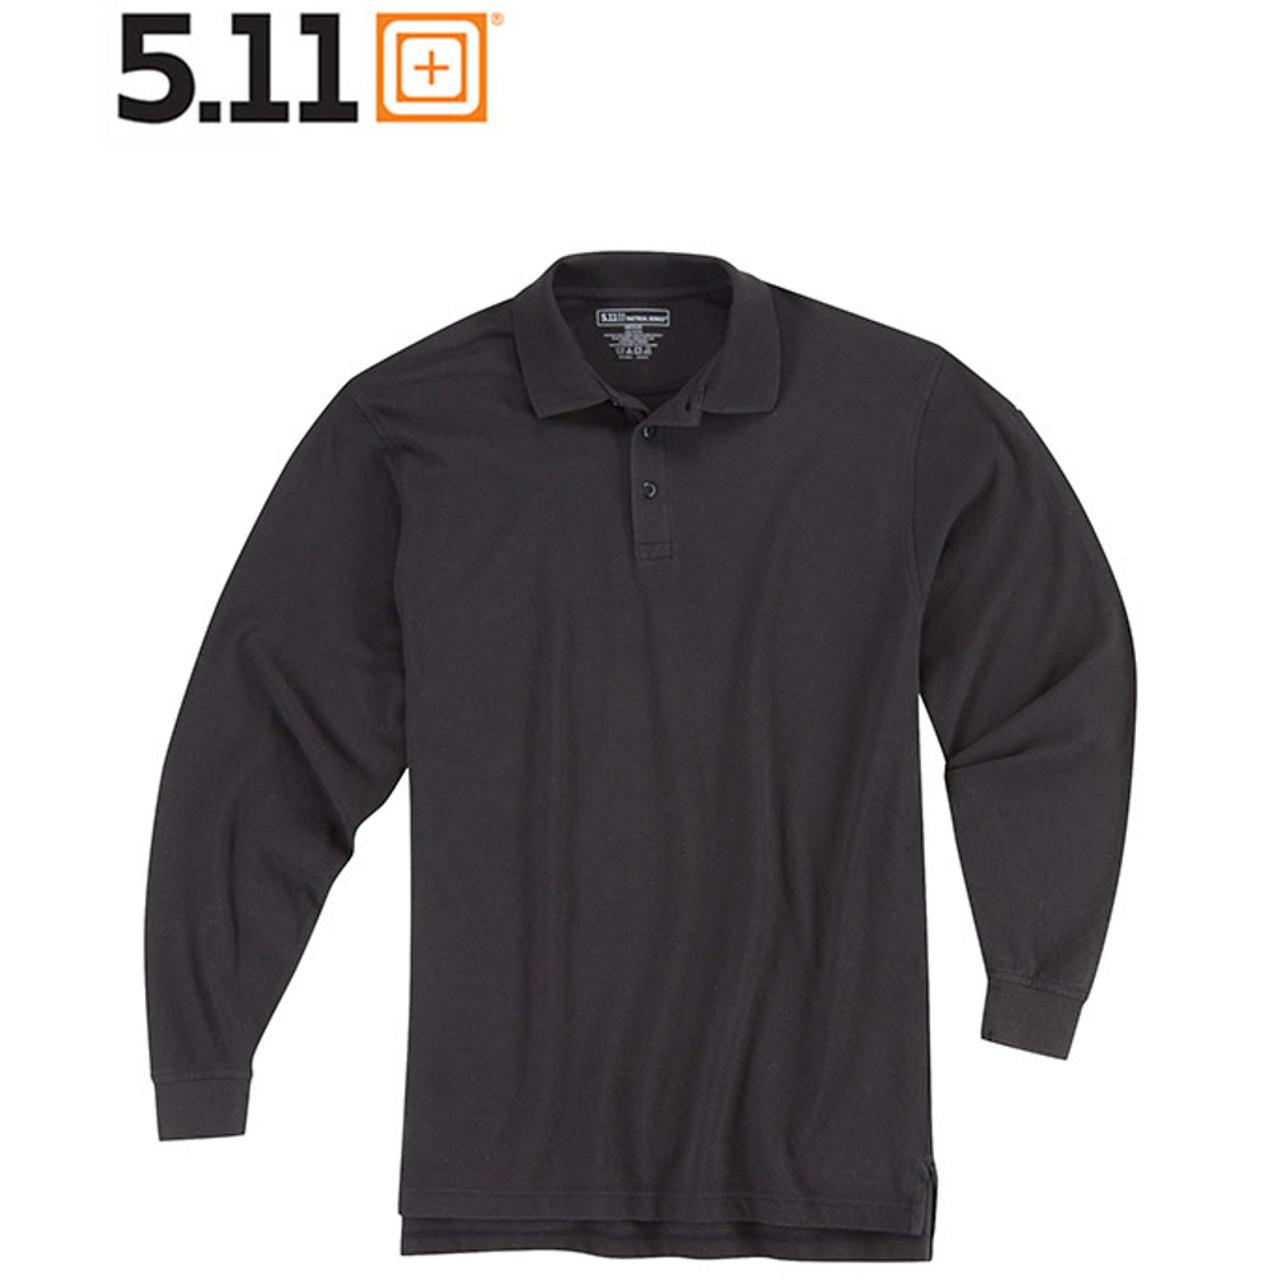 5.11 UTILITY POLO Langarm-Shirt black